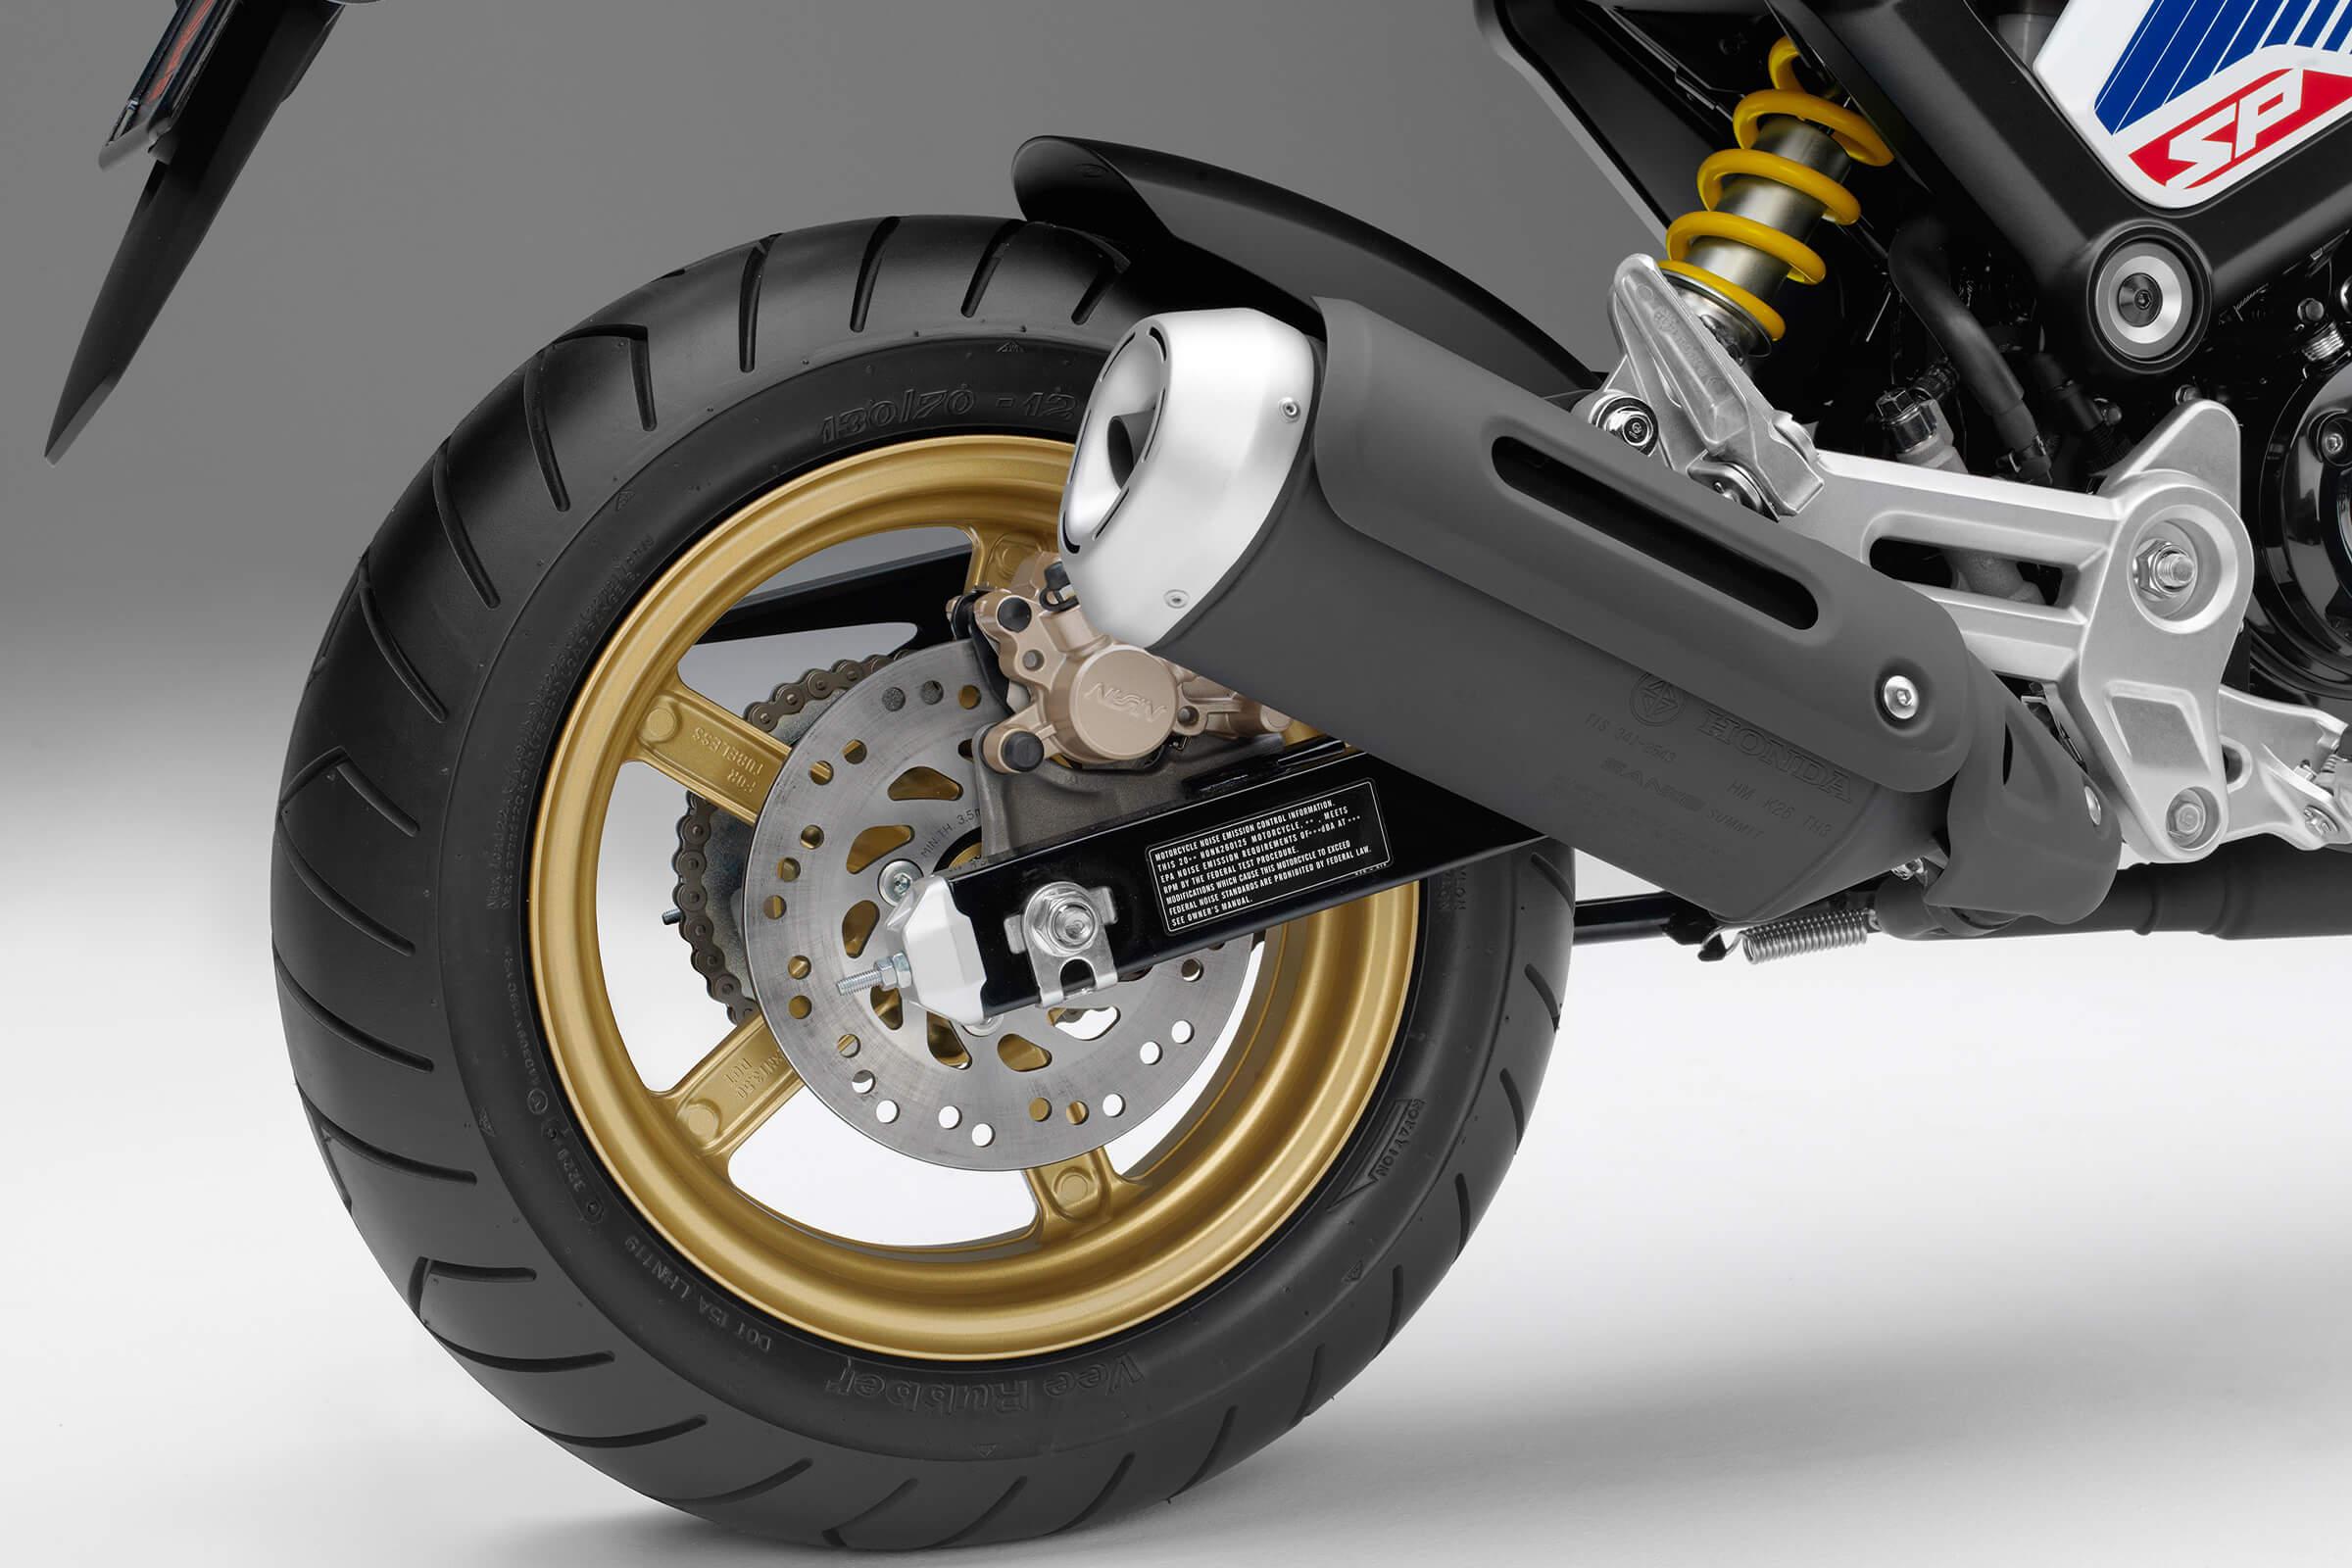 2021 Honda Grom Exhaust System